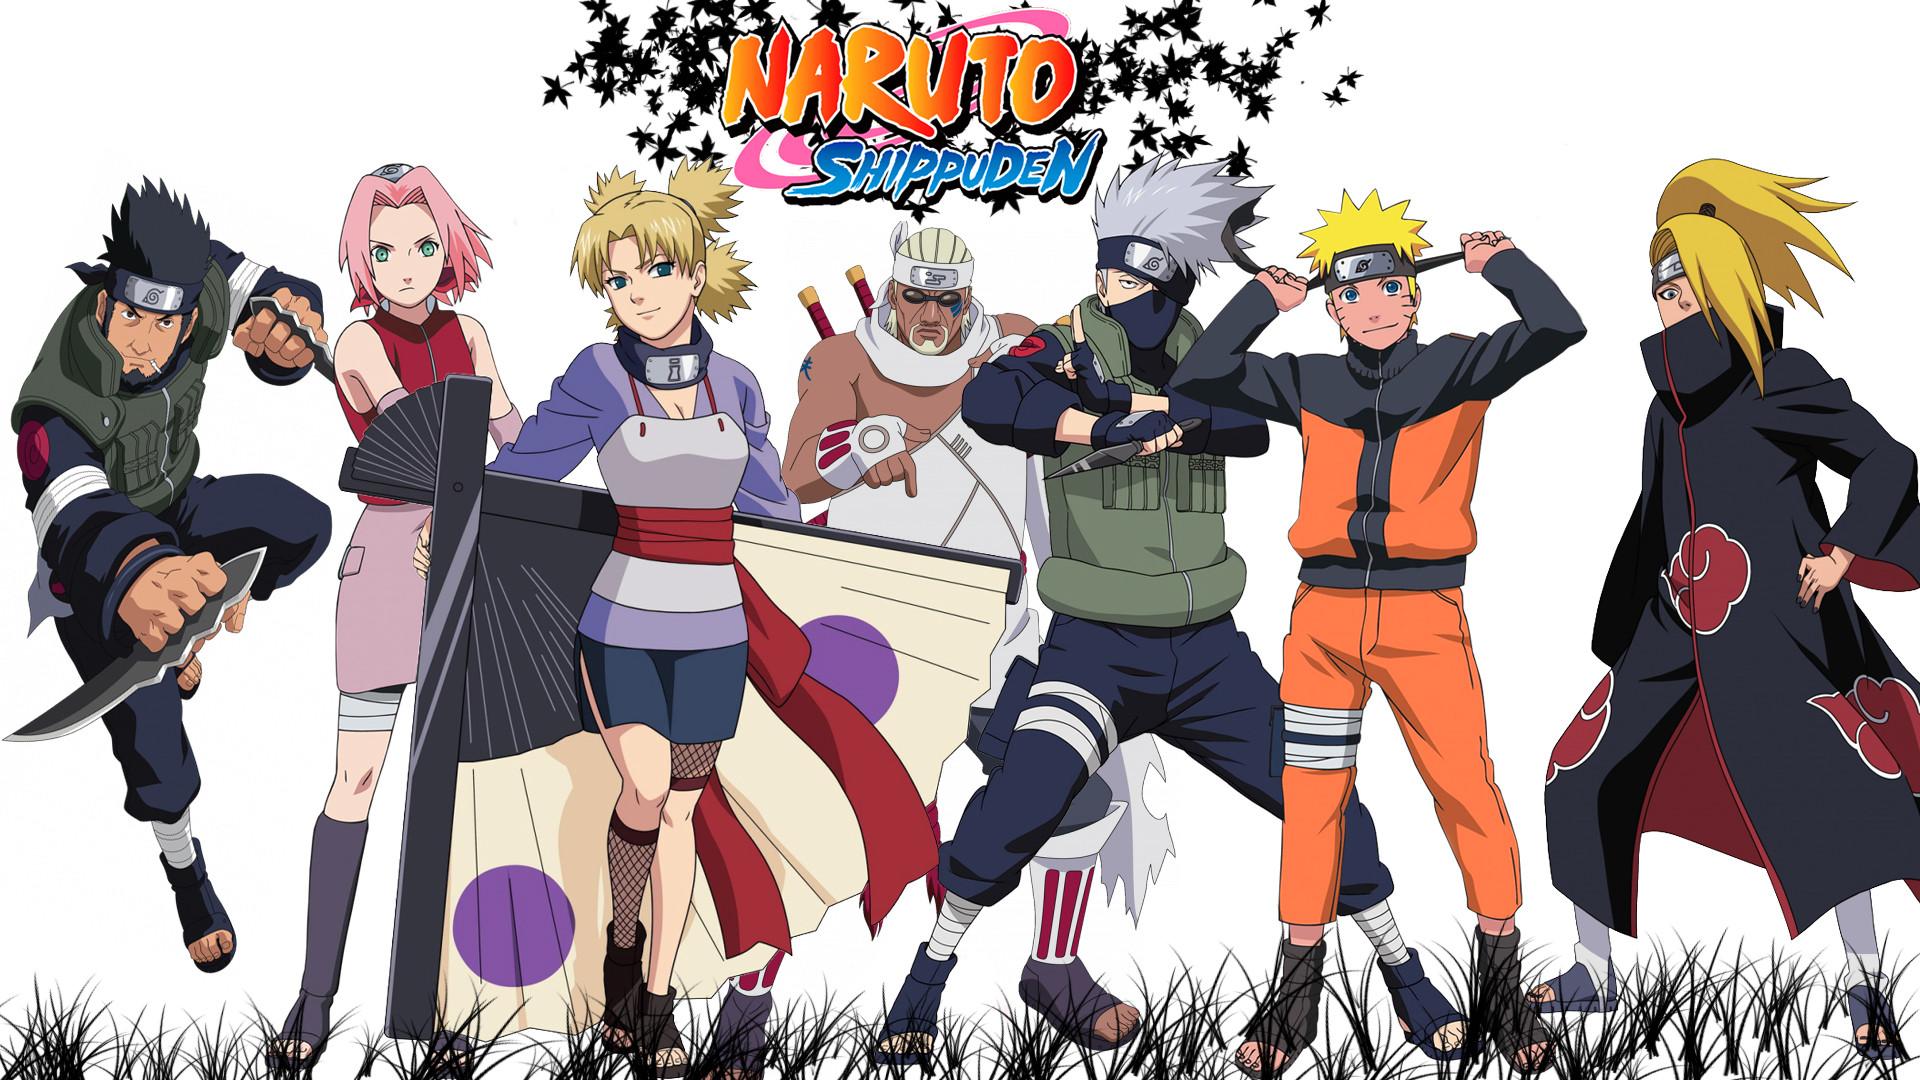 Naruto Shippuden wallpapers HD | PixelsTalk Net